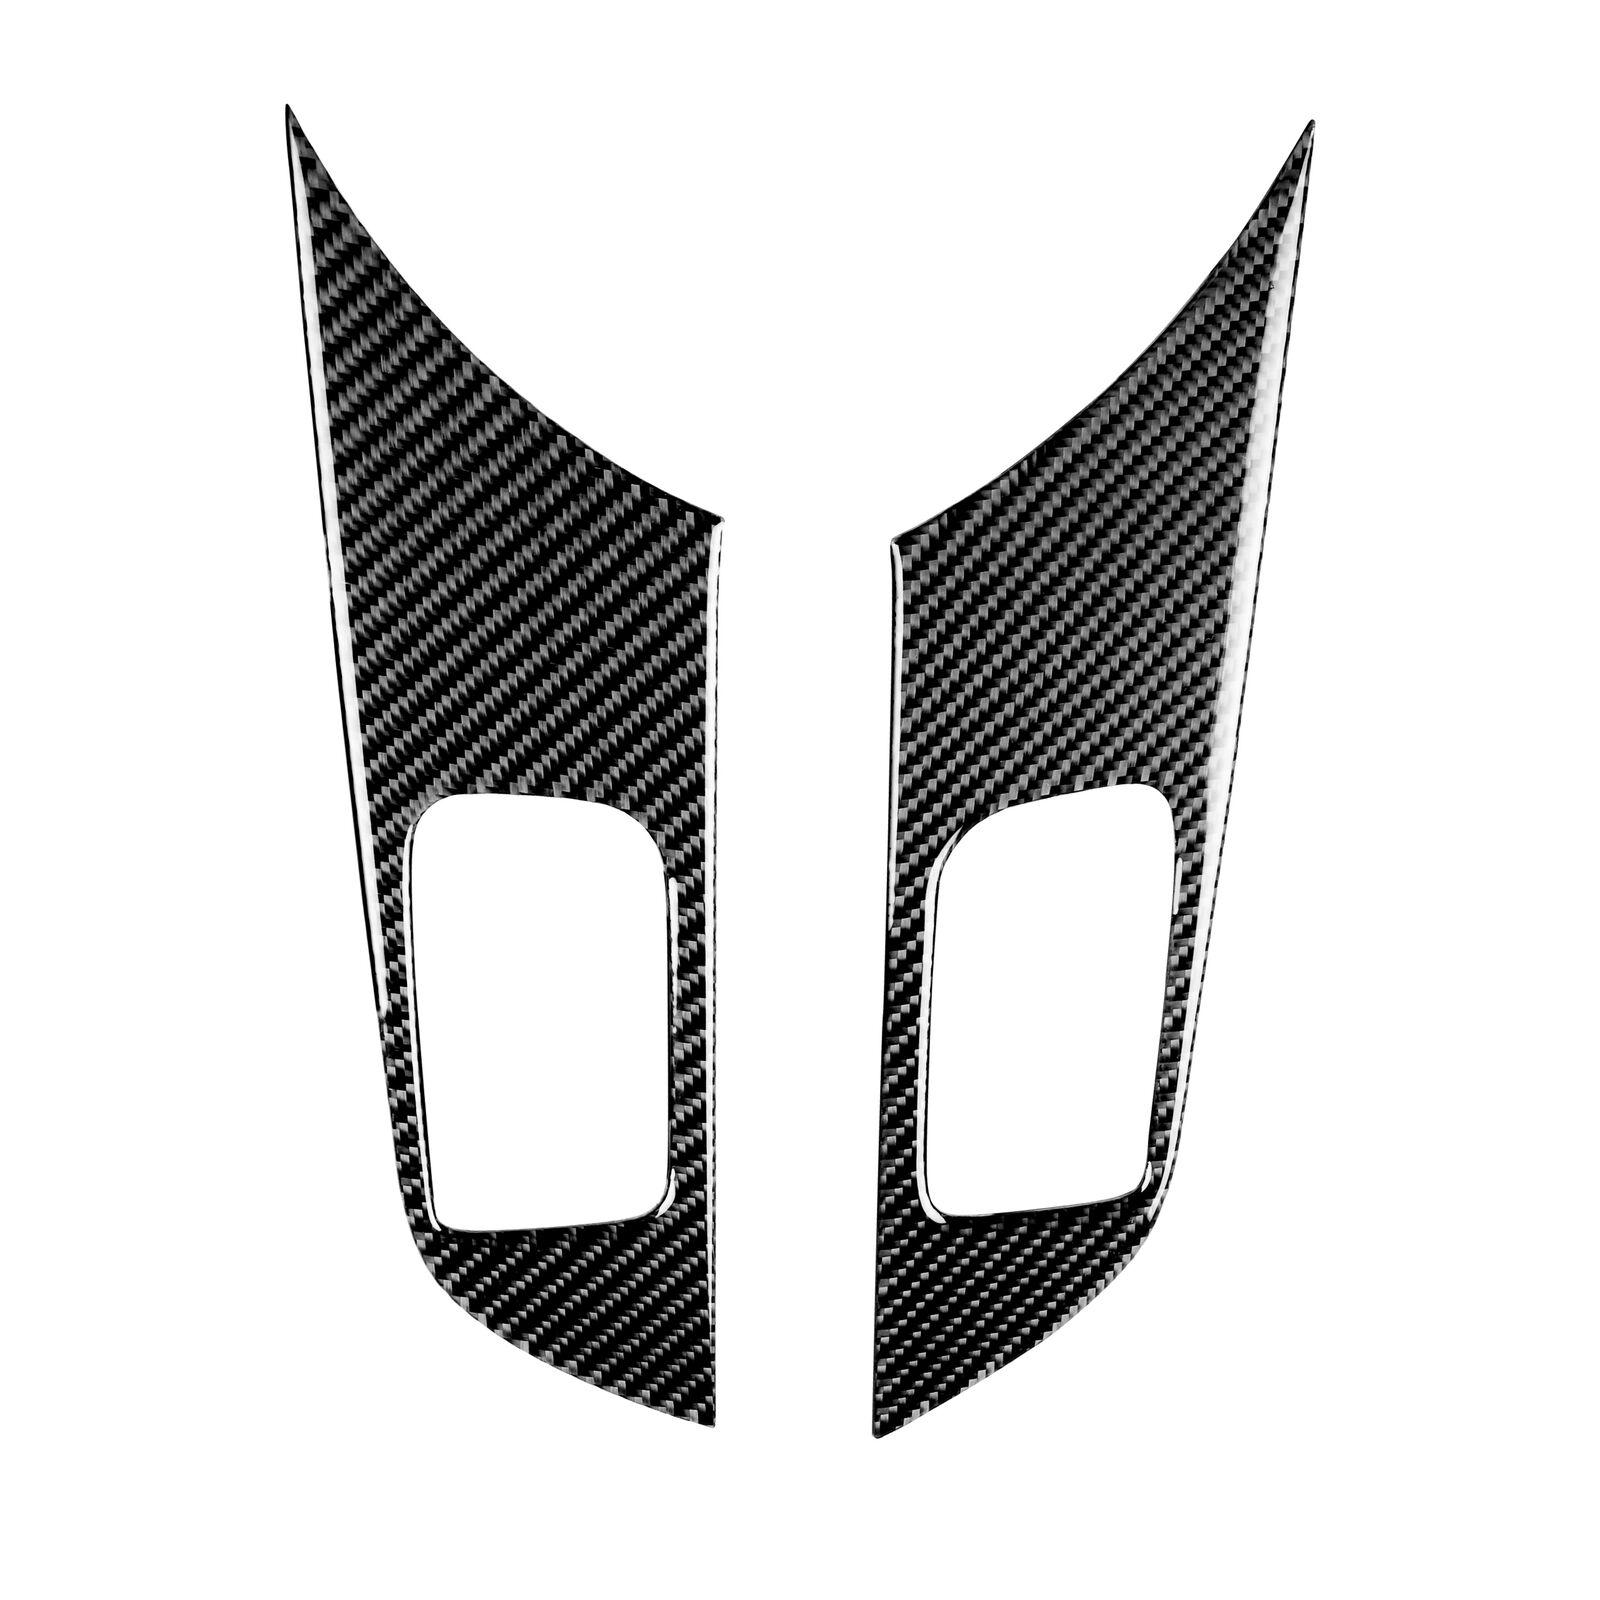 2pcs/pair Carbon Fiber Window Lift Switch Panel Cover For Mitsubishi Lancer EVO X 2008-2014 Carbon black